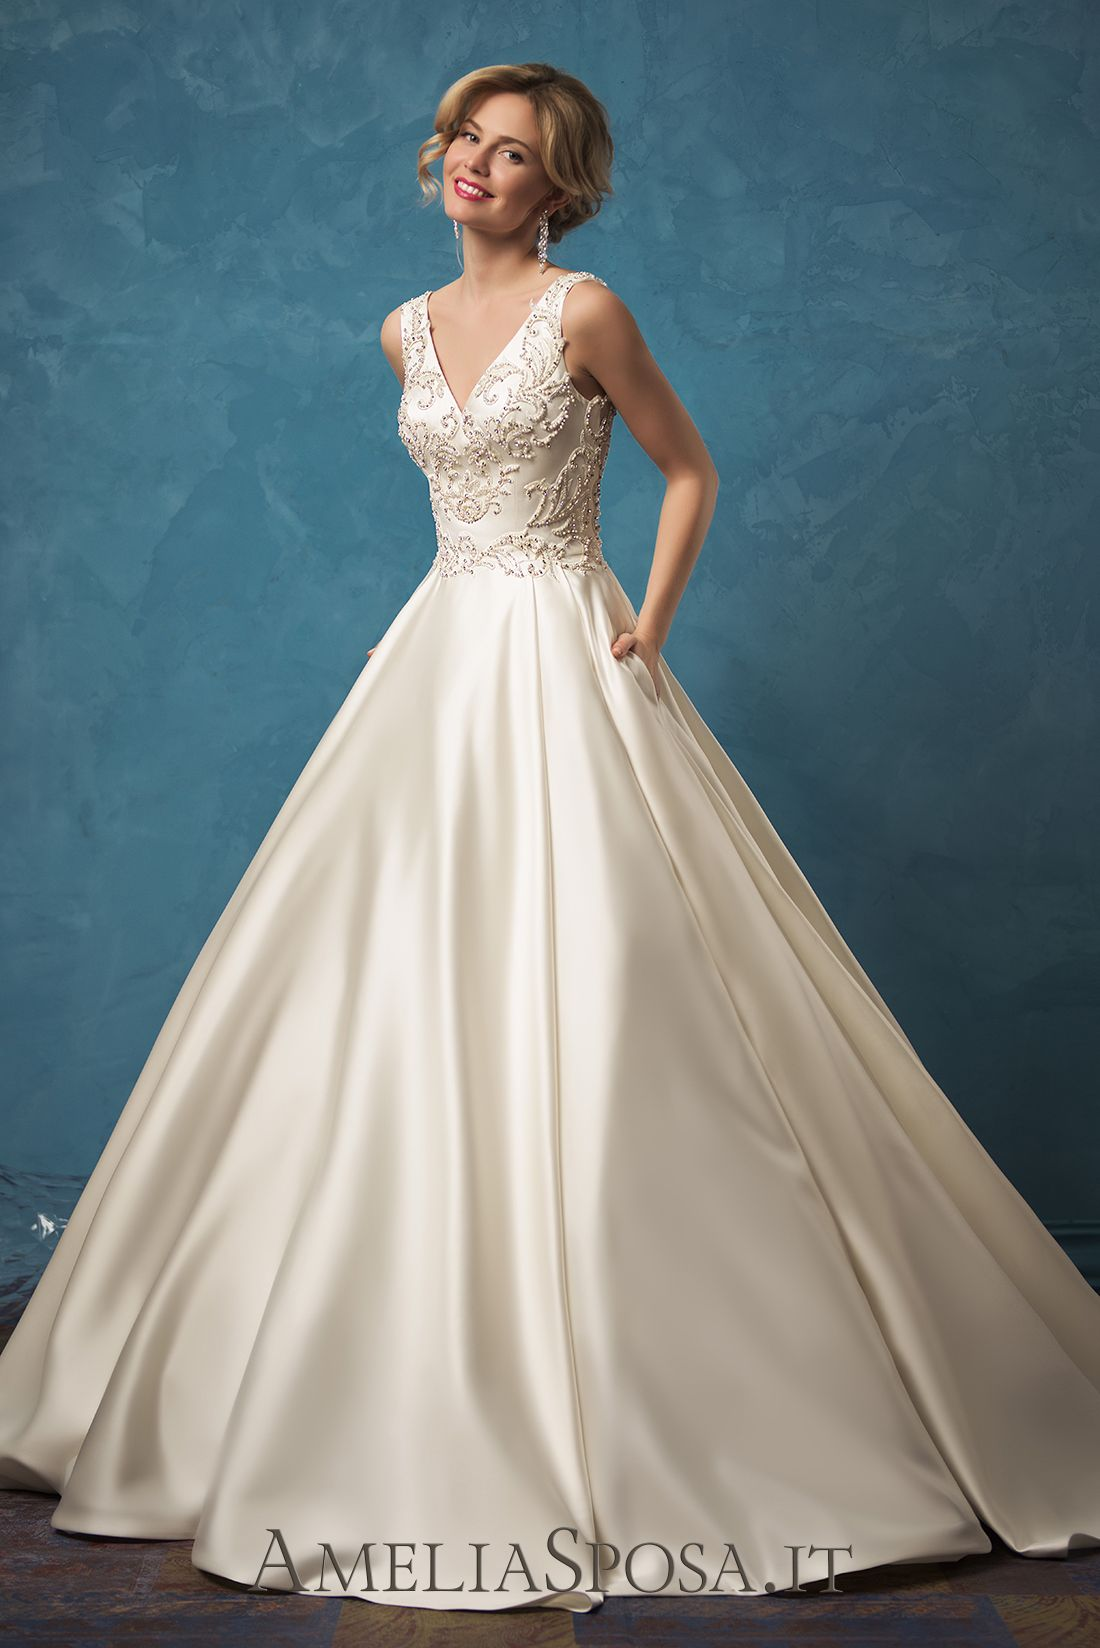 Wedding Dress Noemi, Silhouette: A-line | Sleeveless Matrimonio ...